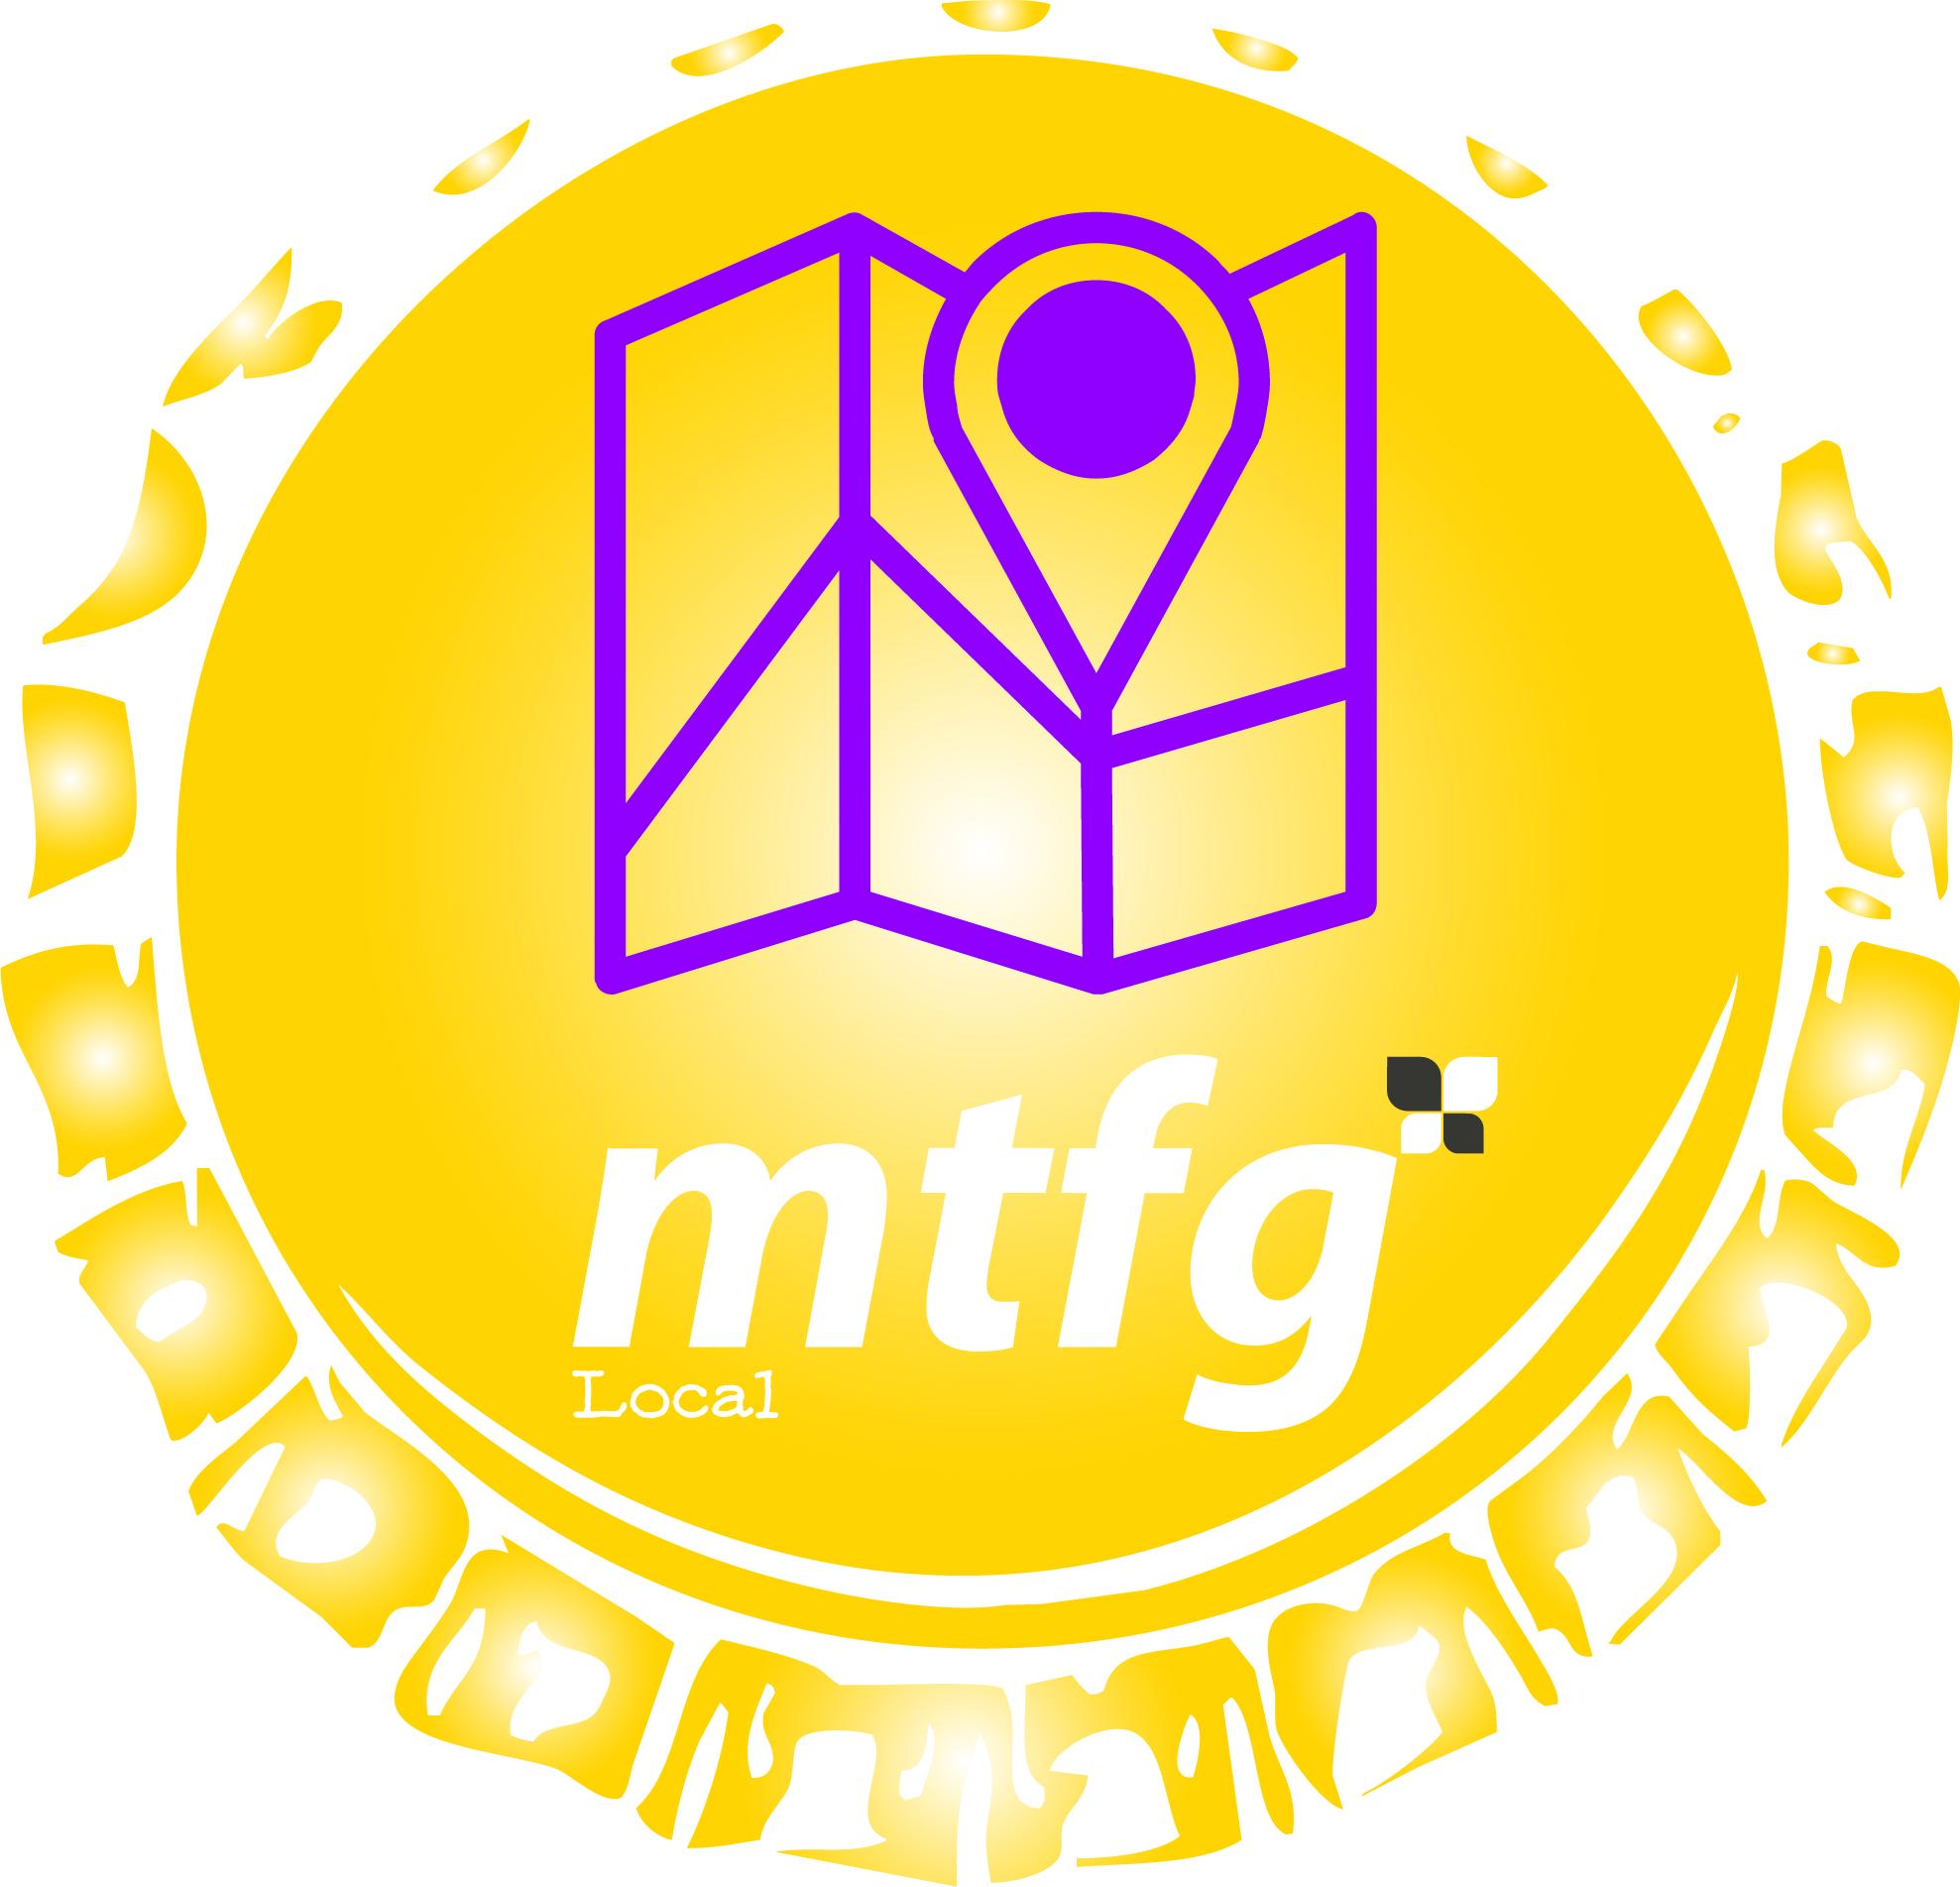 MTFG Local